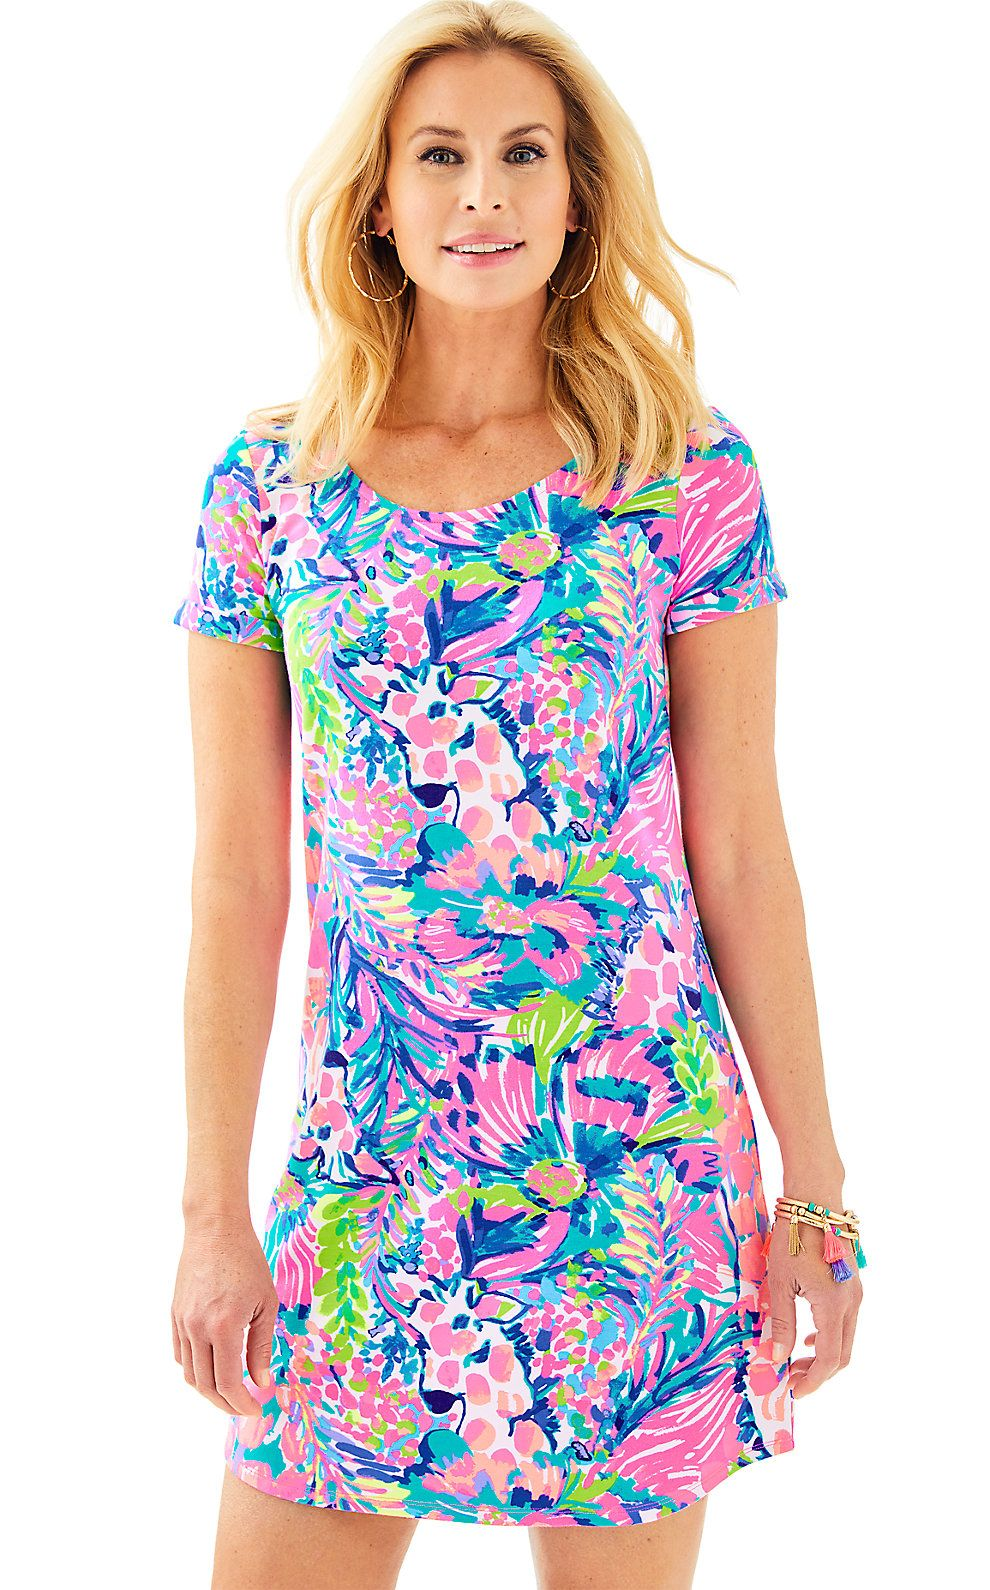 fea90cb41fe Lilly Pulitzer Womens UPF 50+ Tammy Dress